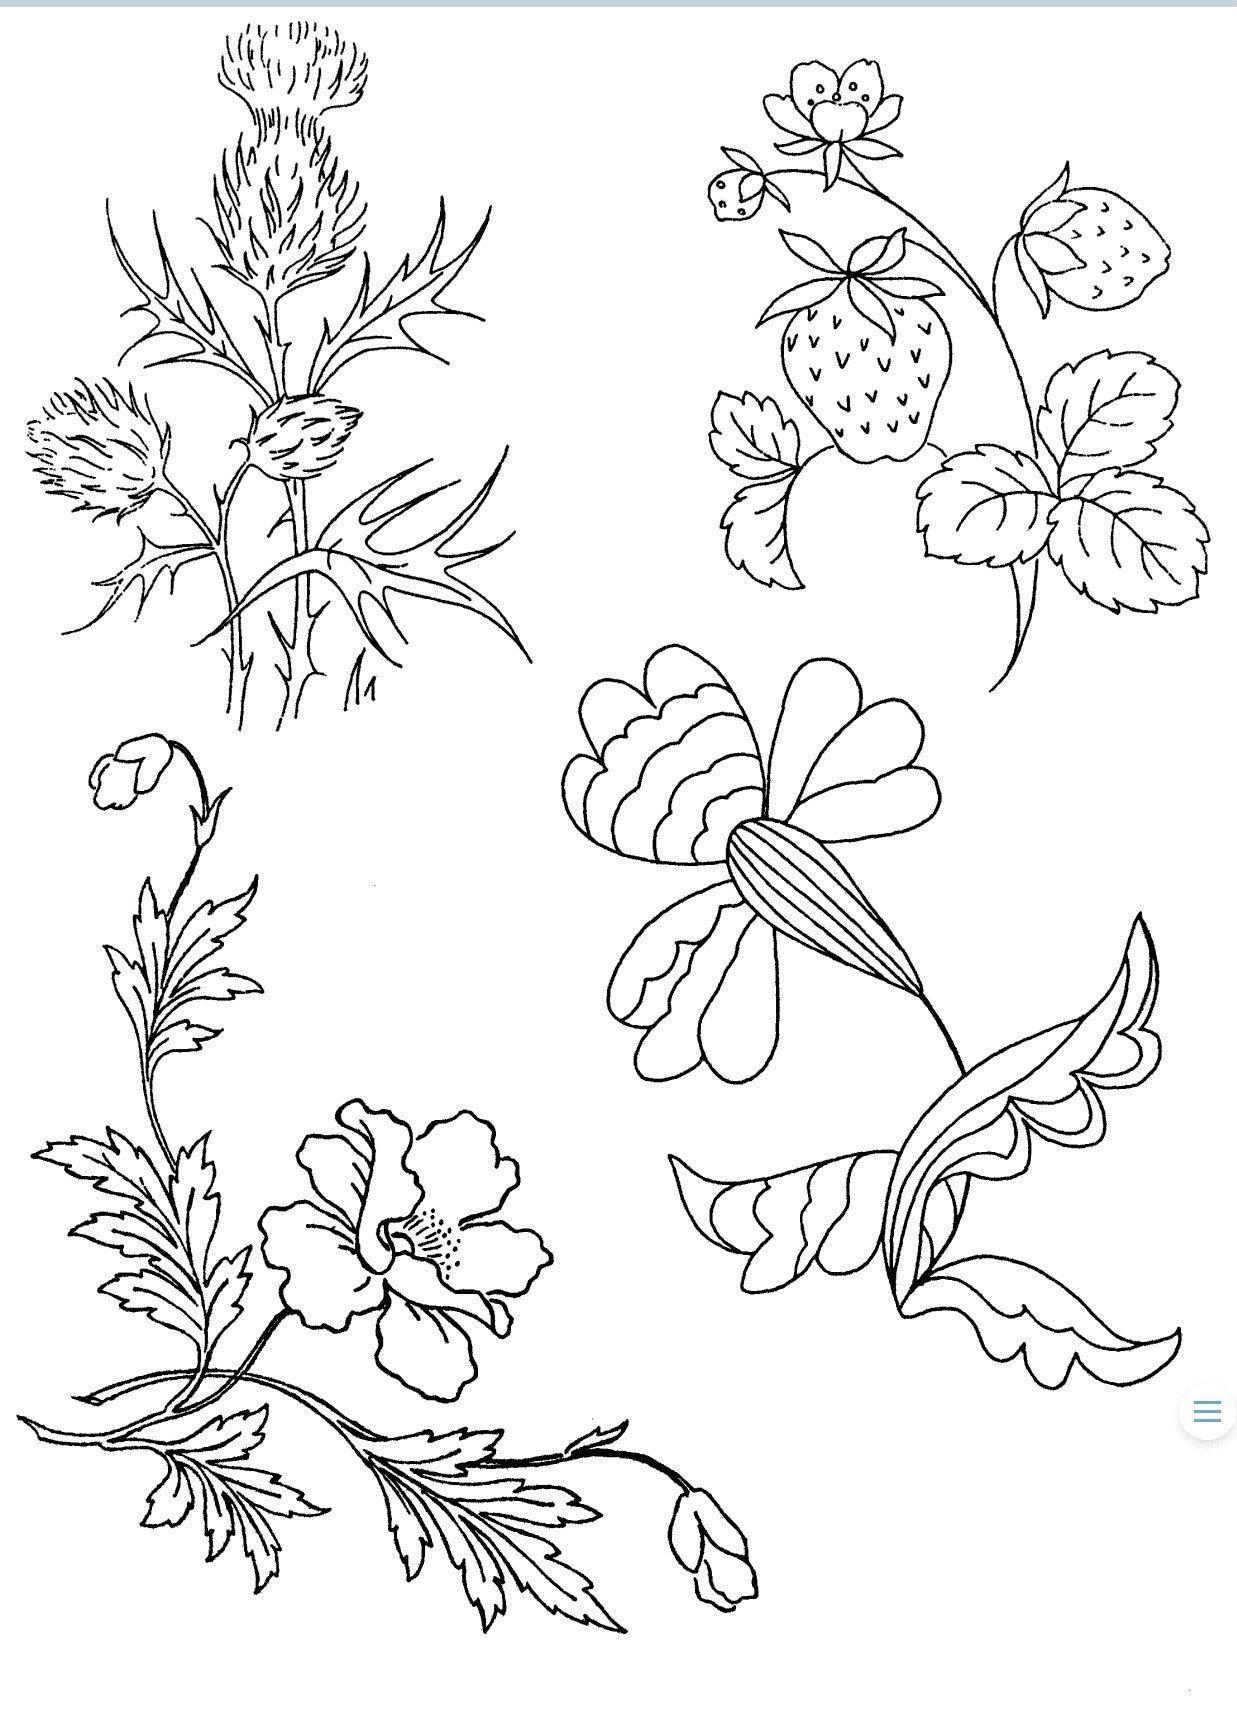 Hand Stitch Embroidery Patterns Free   Embroidery patterns free ...